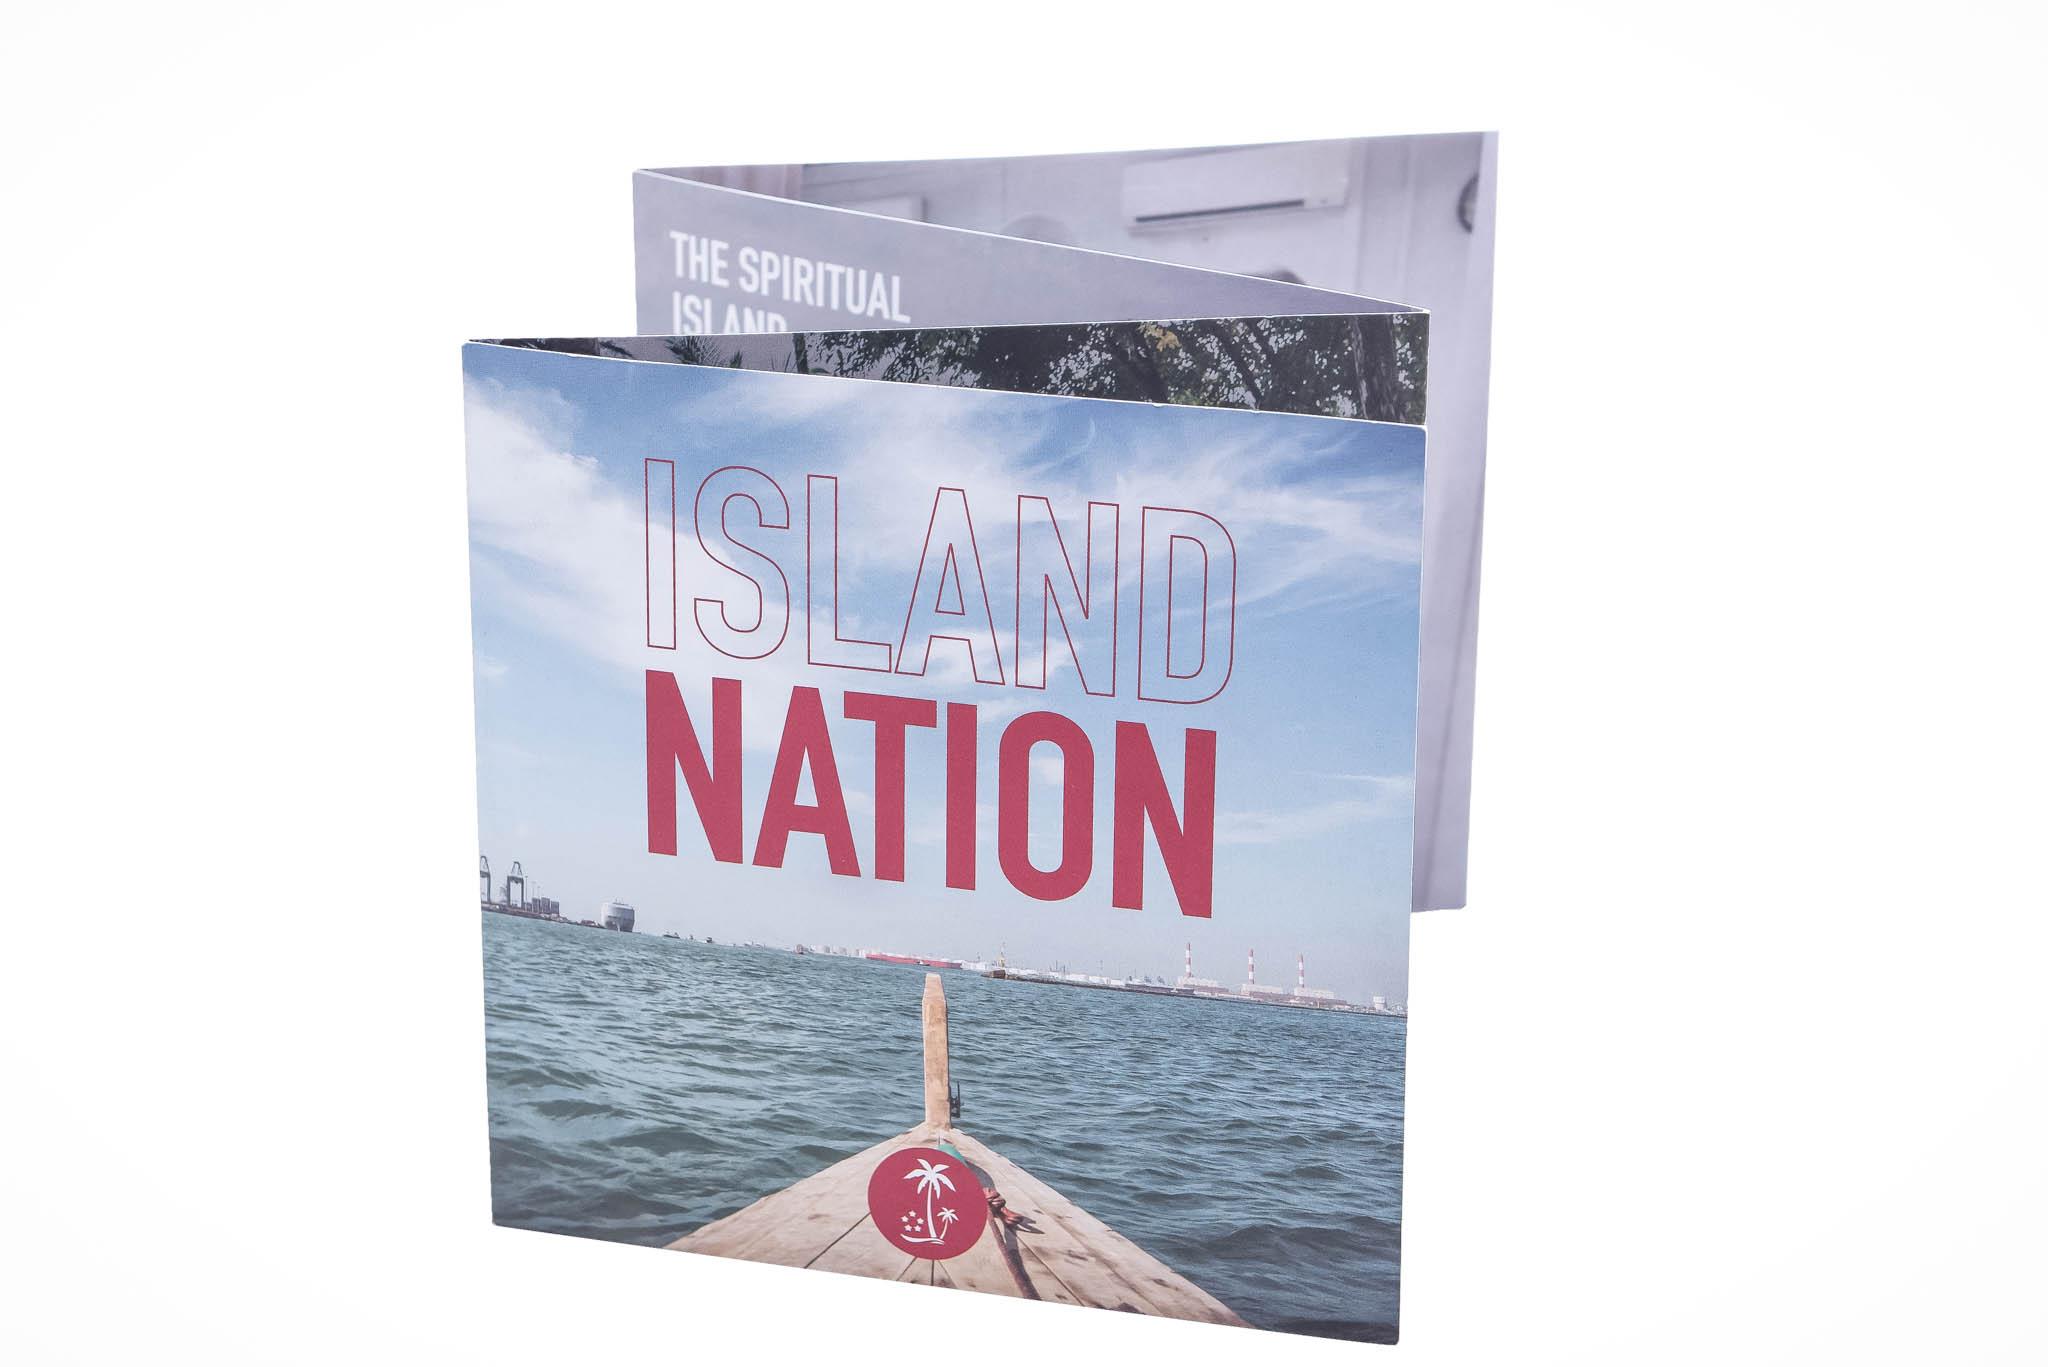 ISLAND NATION: Exhibition brochure